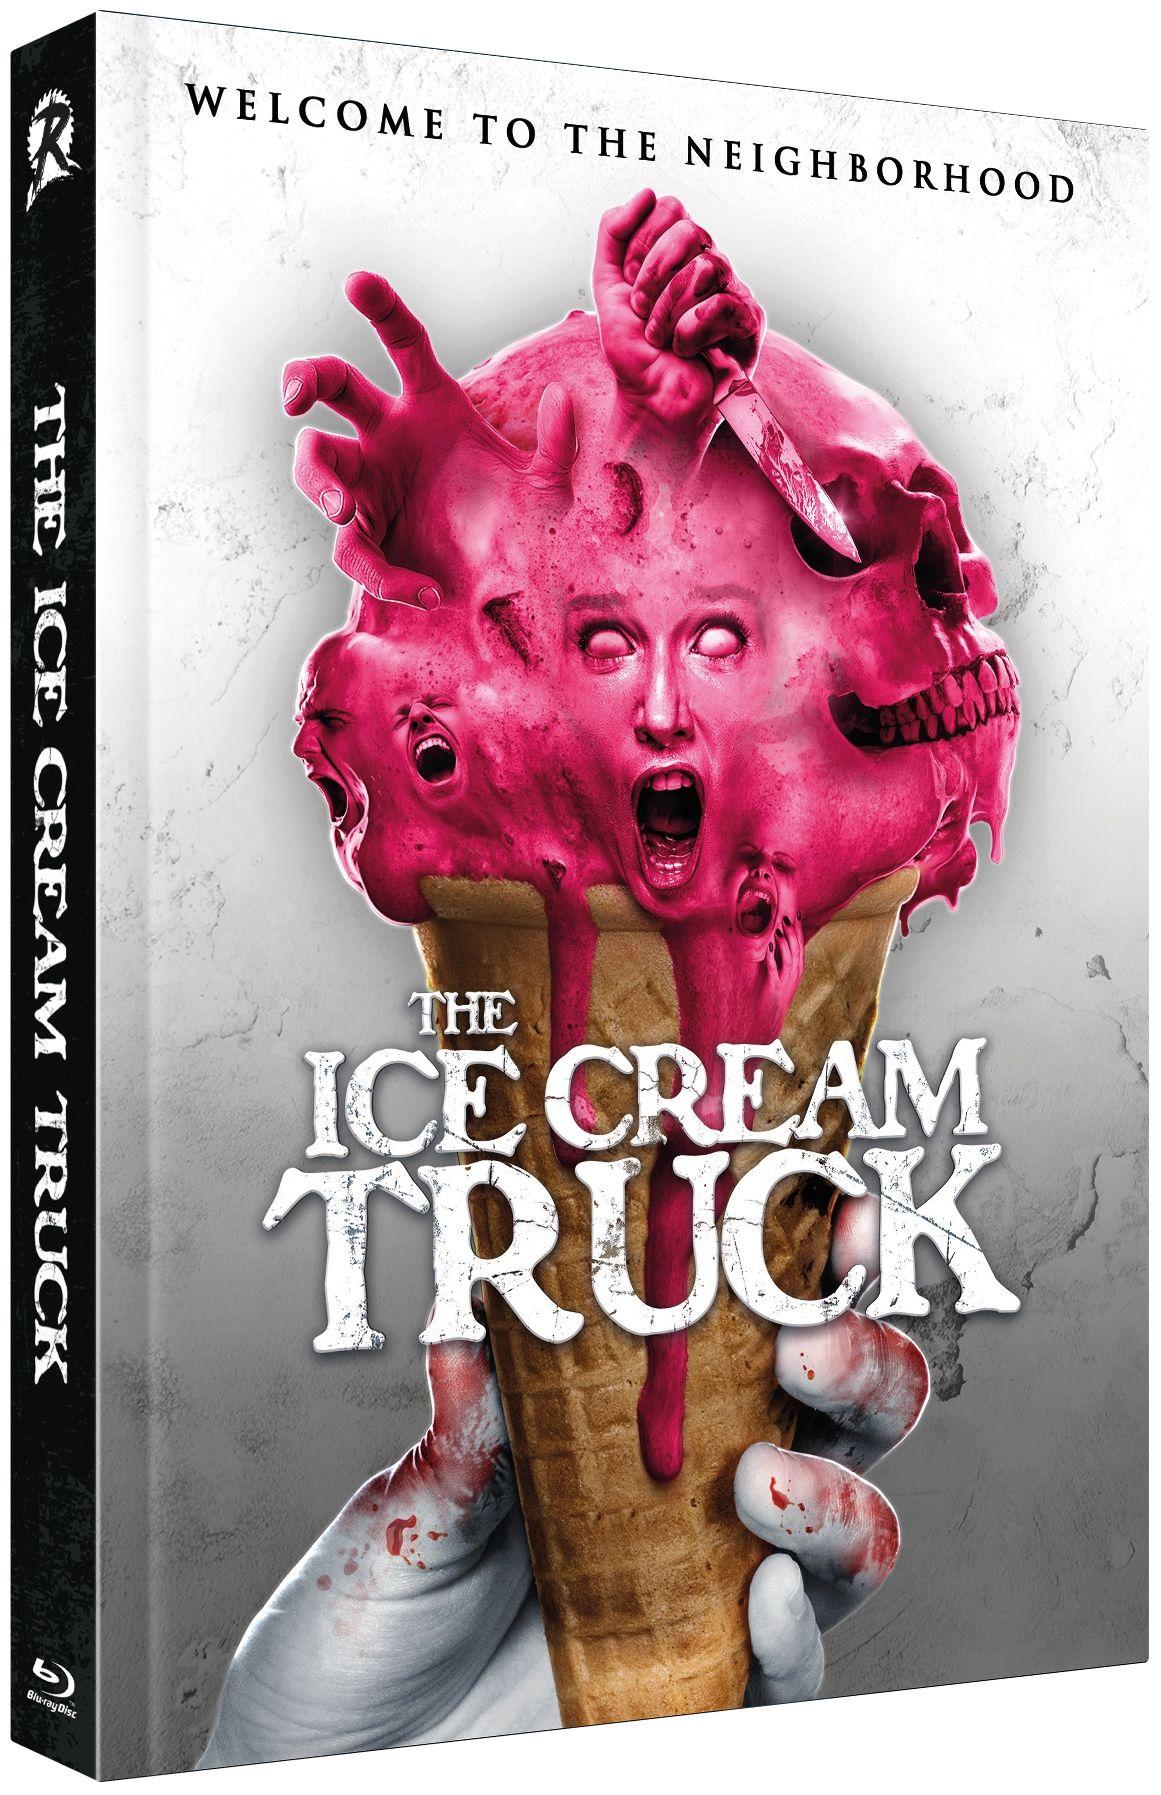 Ice Cream Truck, The (Lim. Uncut Mediabook - Cover A) (DVD + BLURAY)